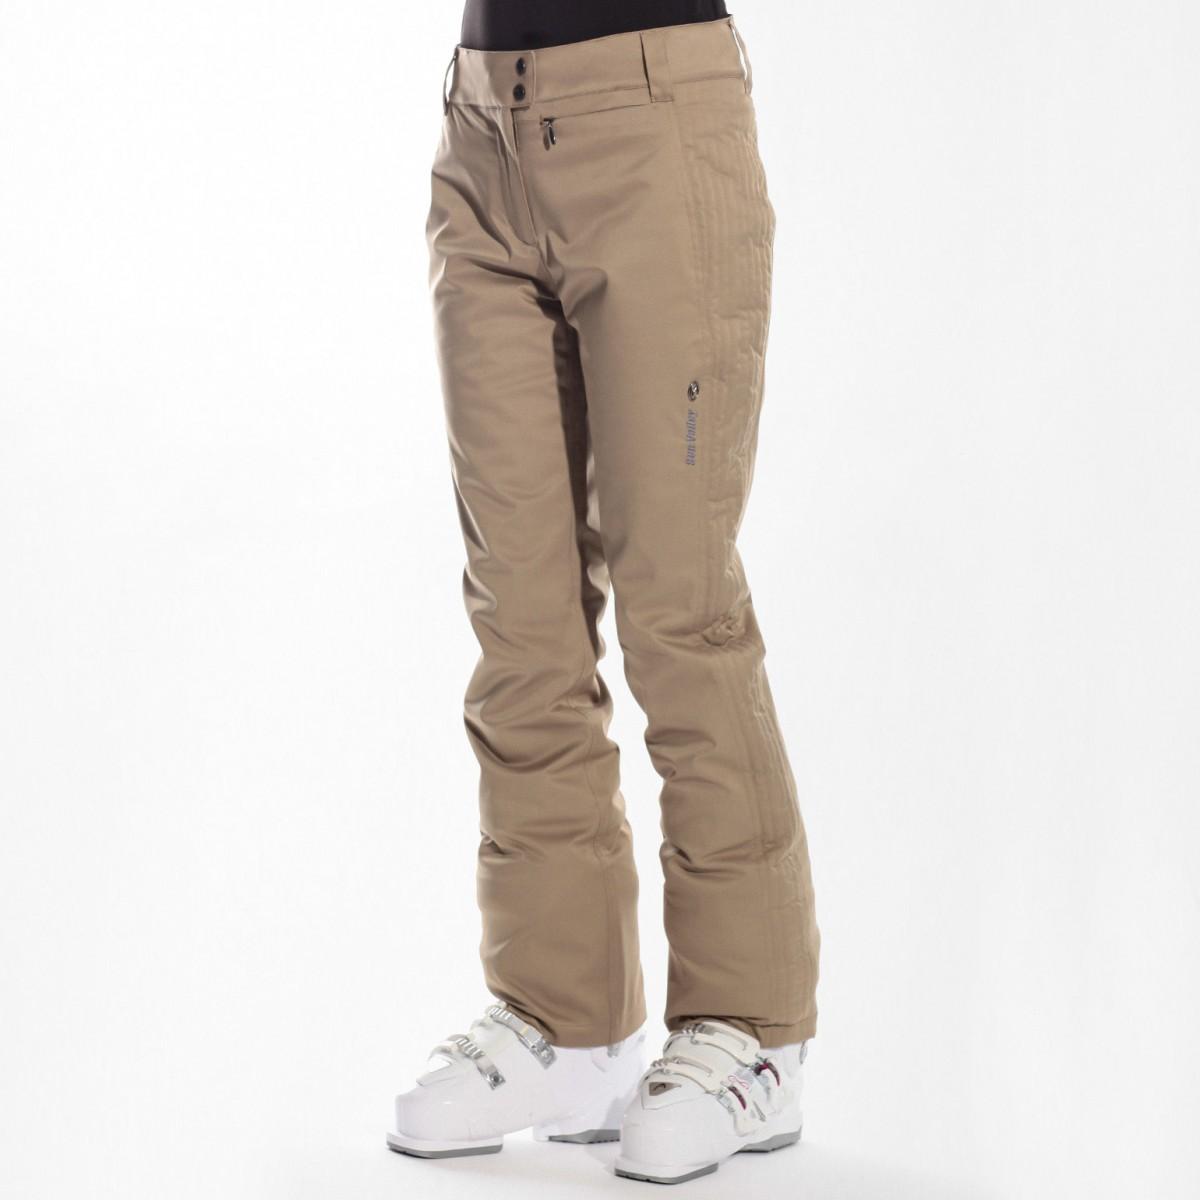 pantalon de ski femme